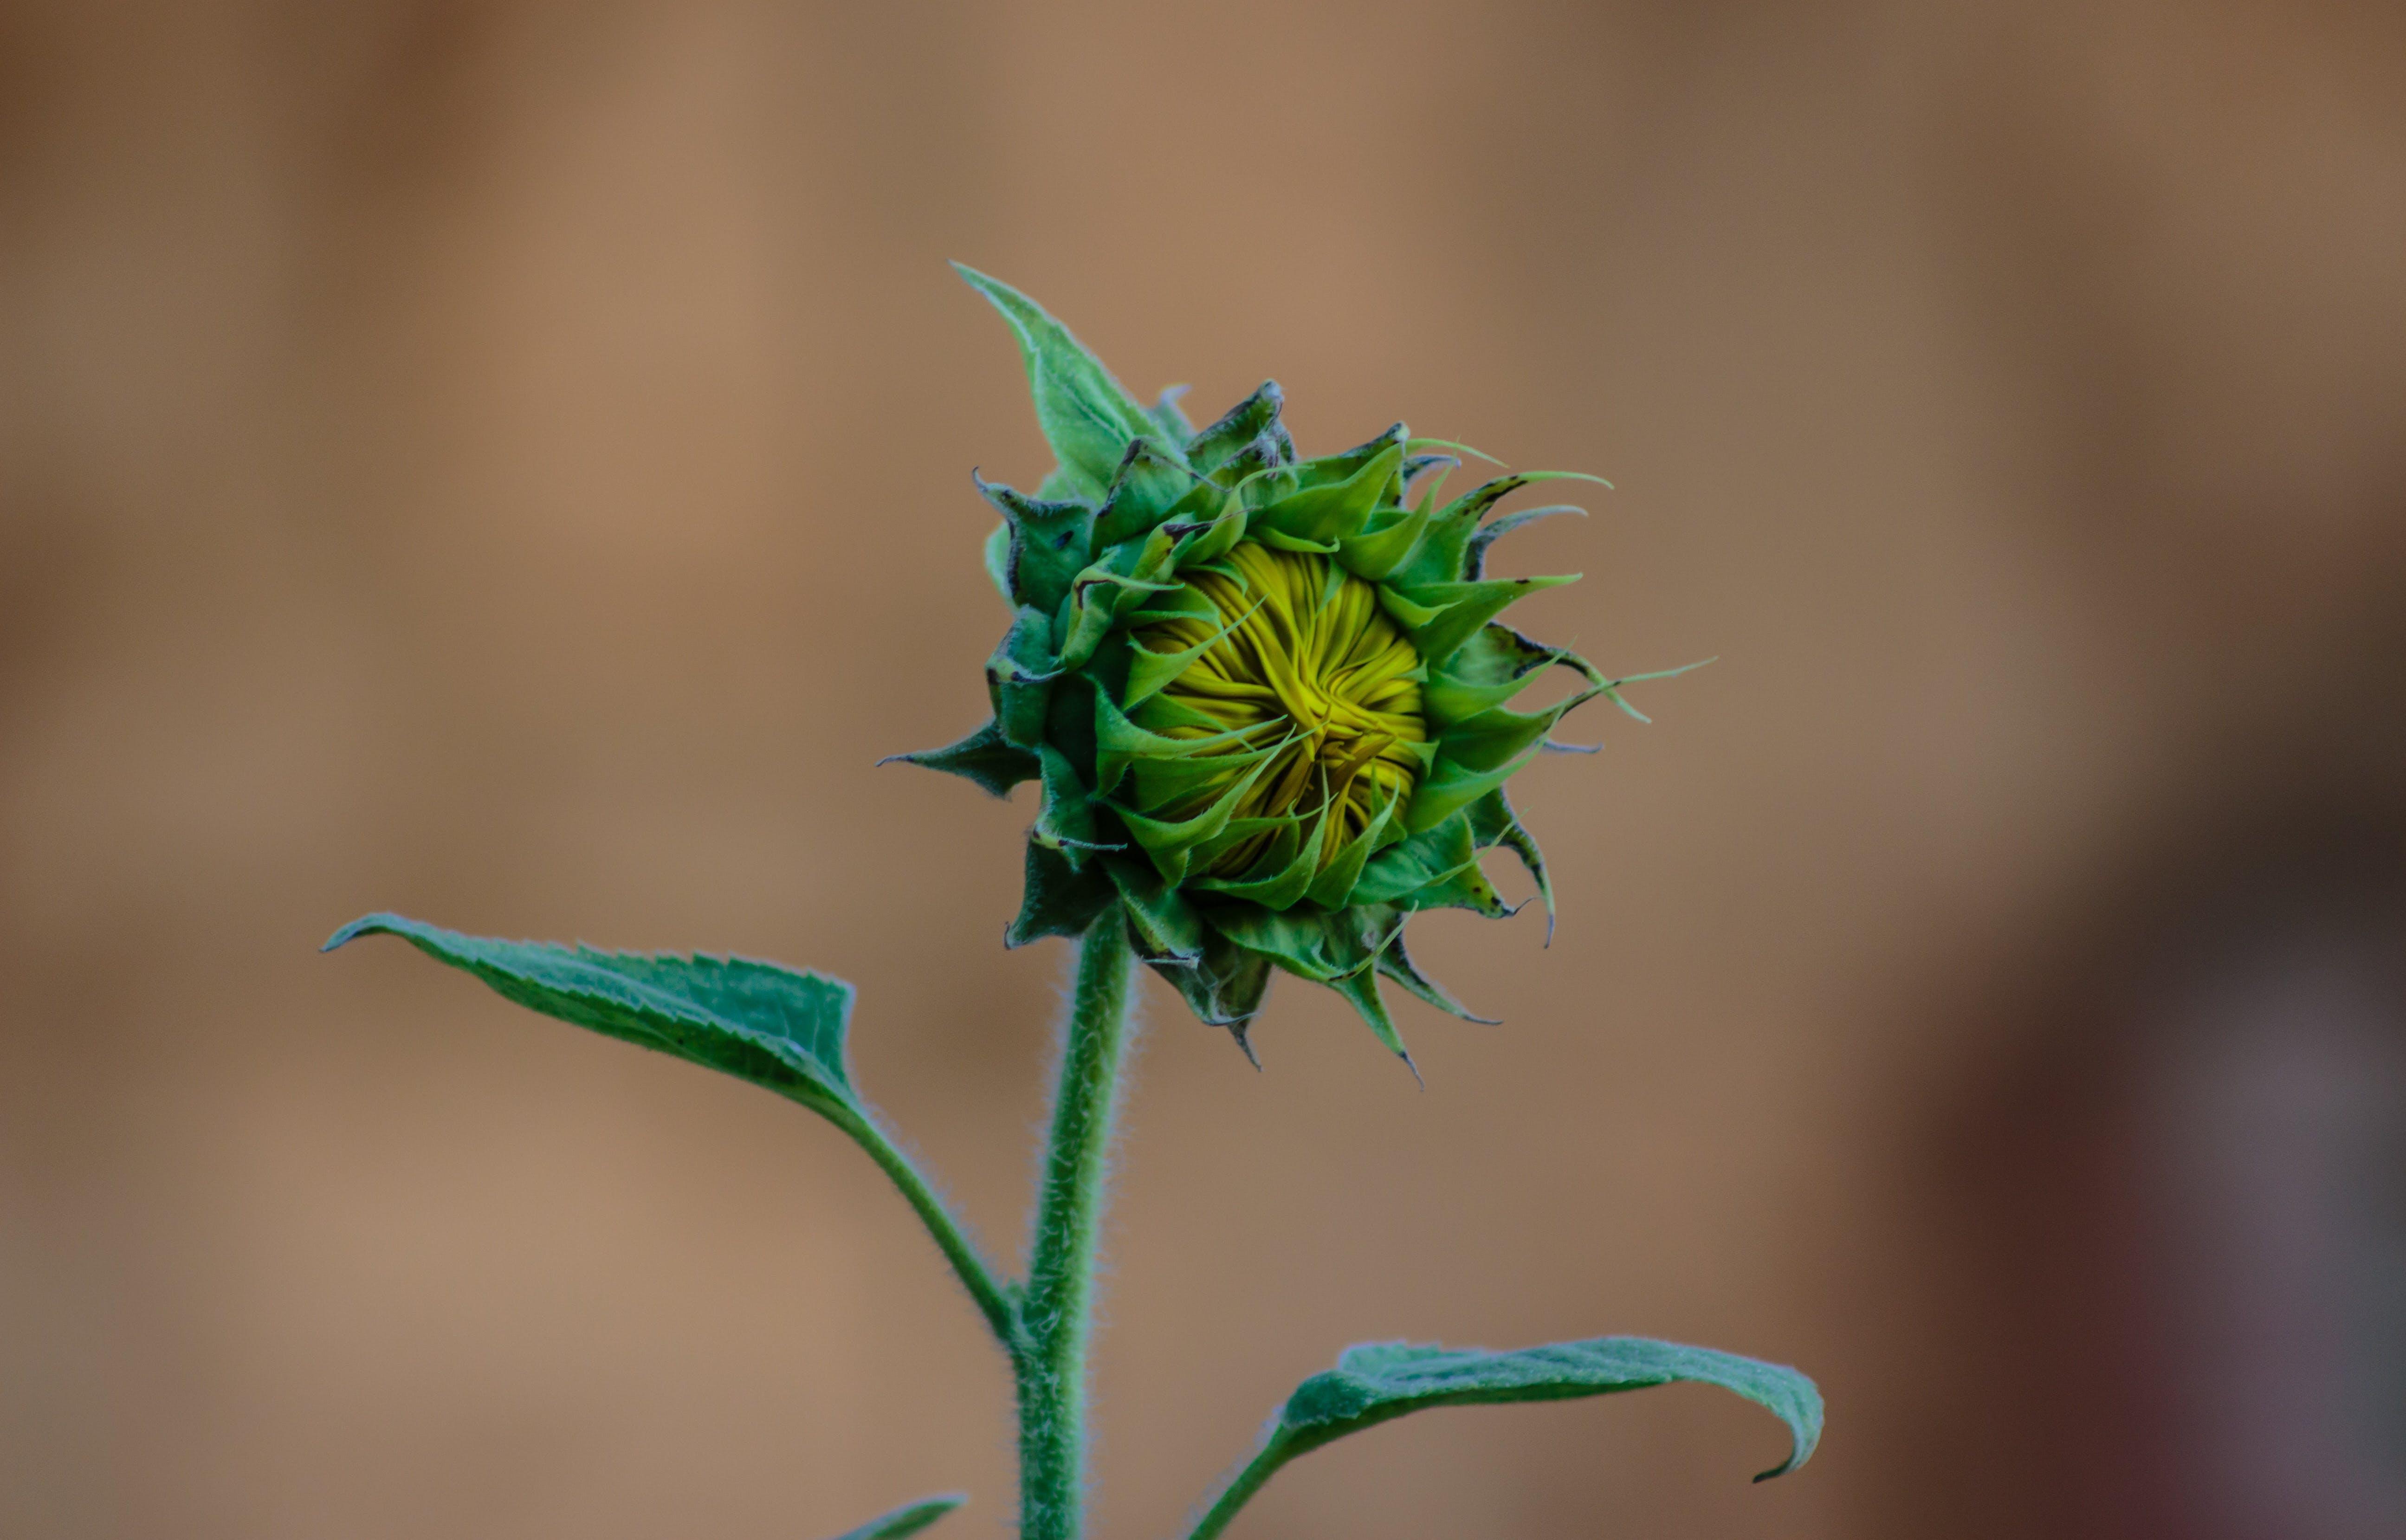 Green Sunflower Bud Macro Photography